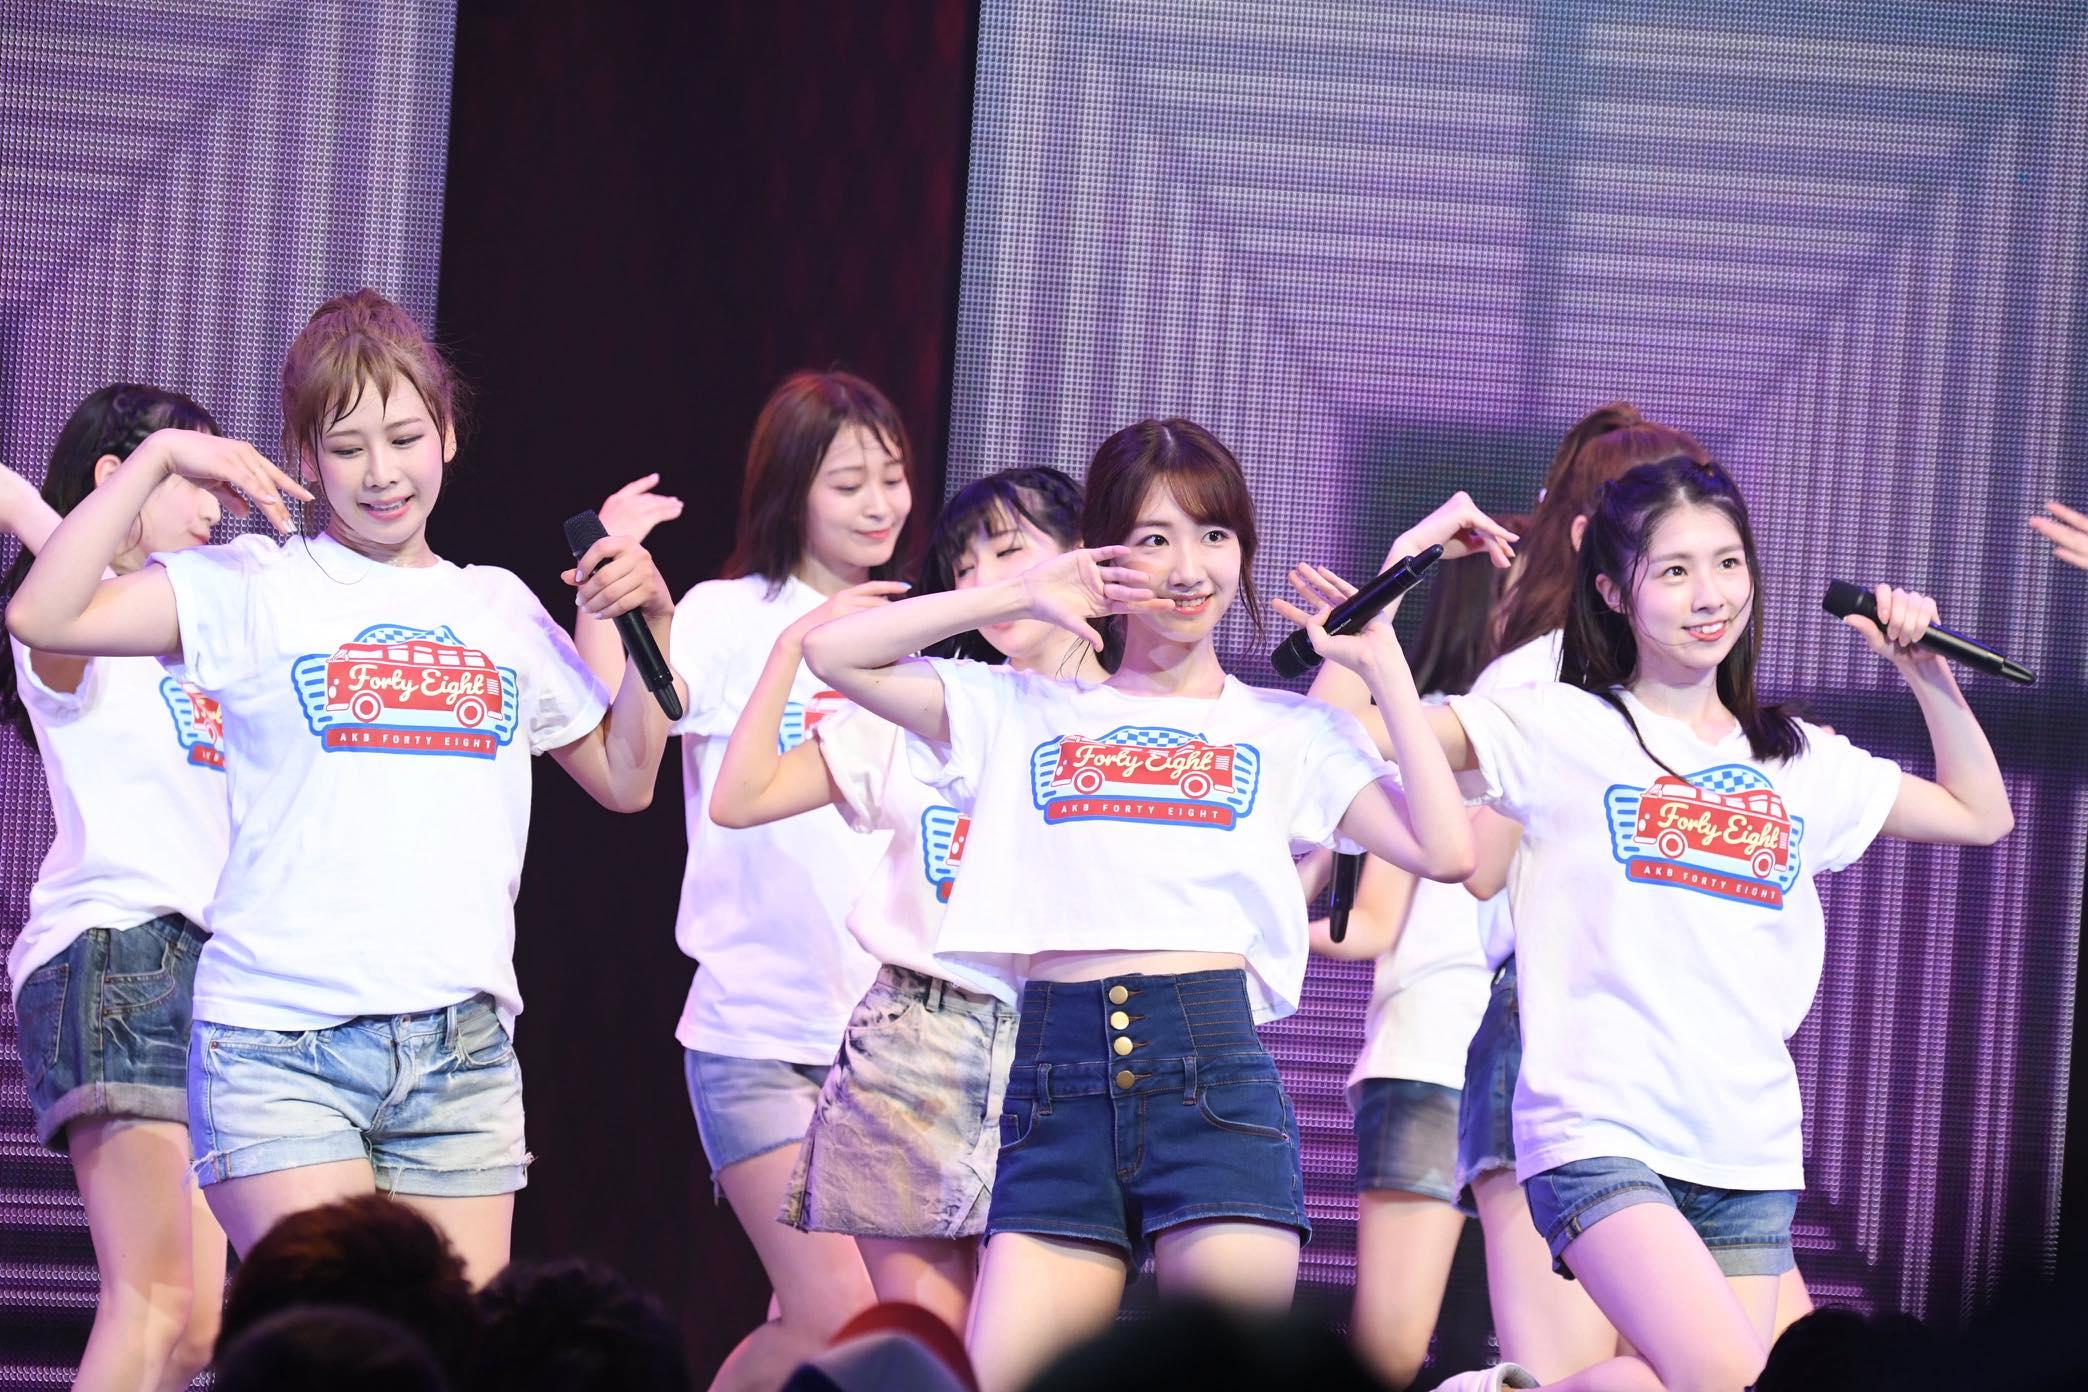 AKB48全国ツアー「神奈川公演」開催、チームBとチーム4のパワーが炸裂!【写真17枚】の画像007